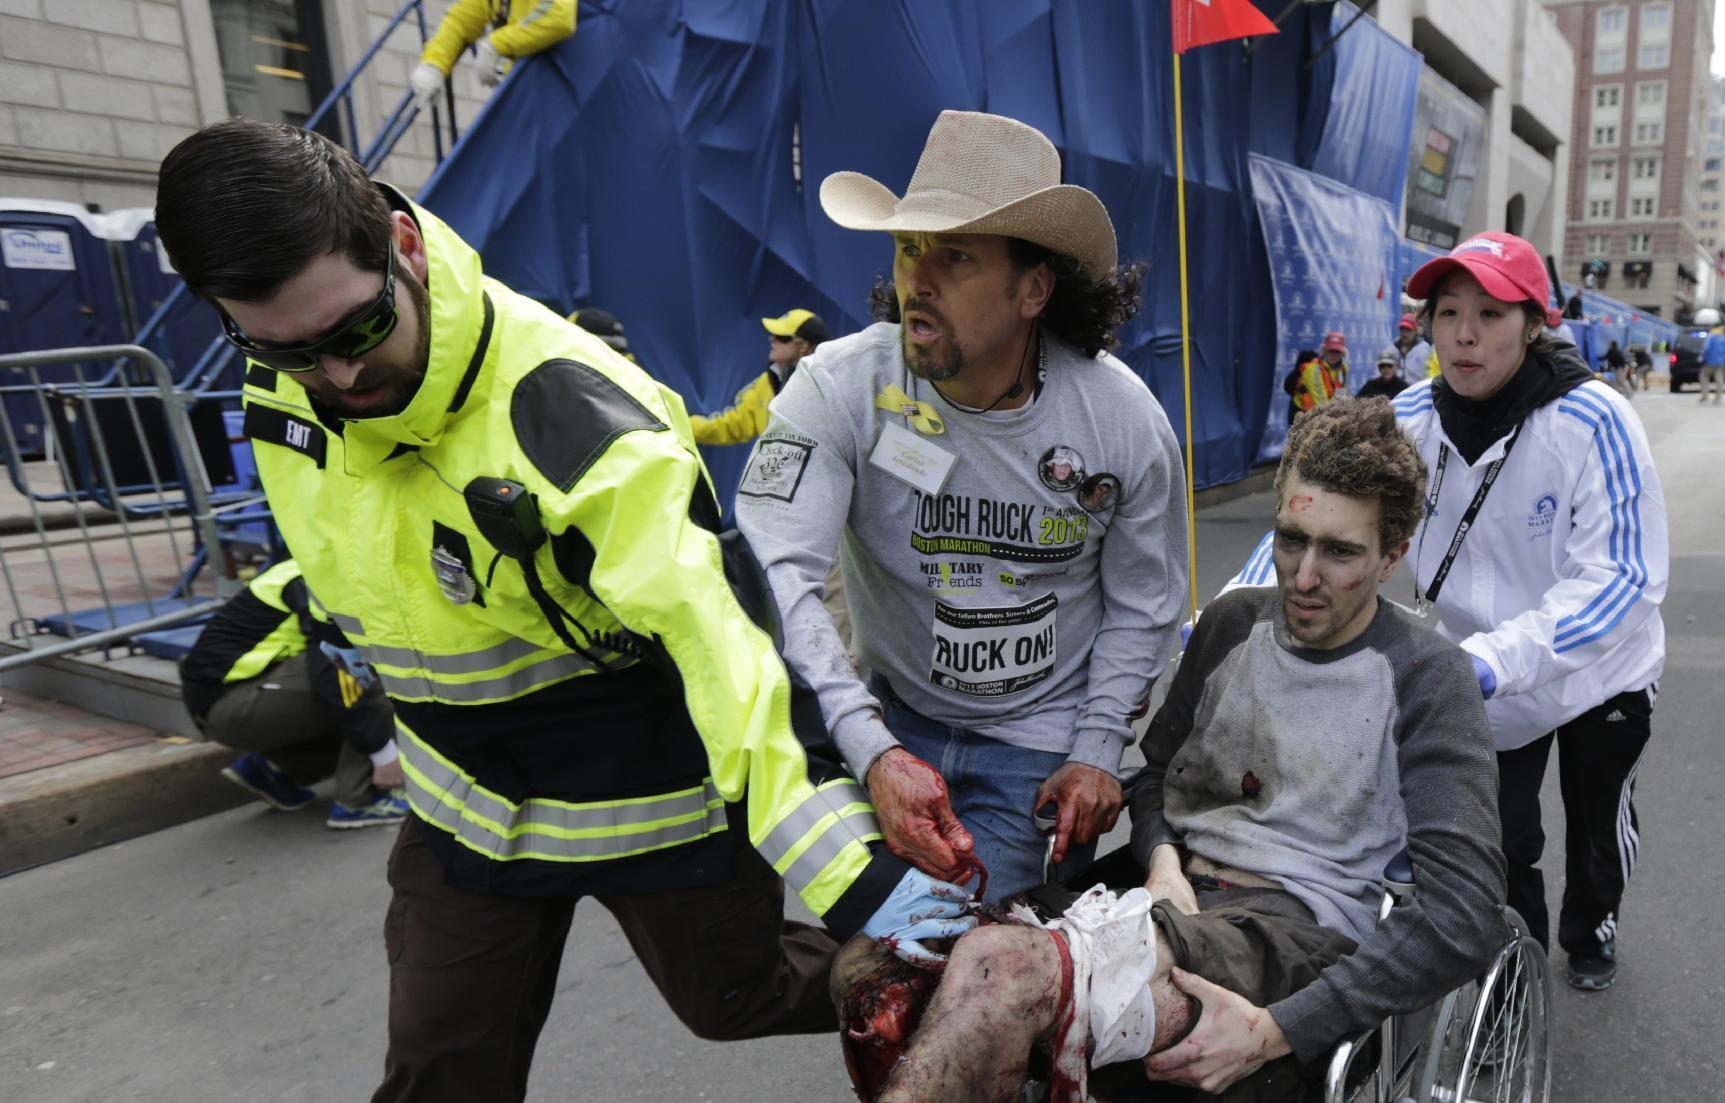 Boston Marathon bombing survivors brace for movies on attack